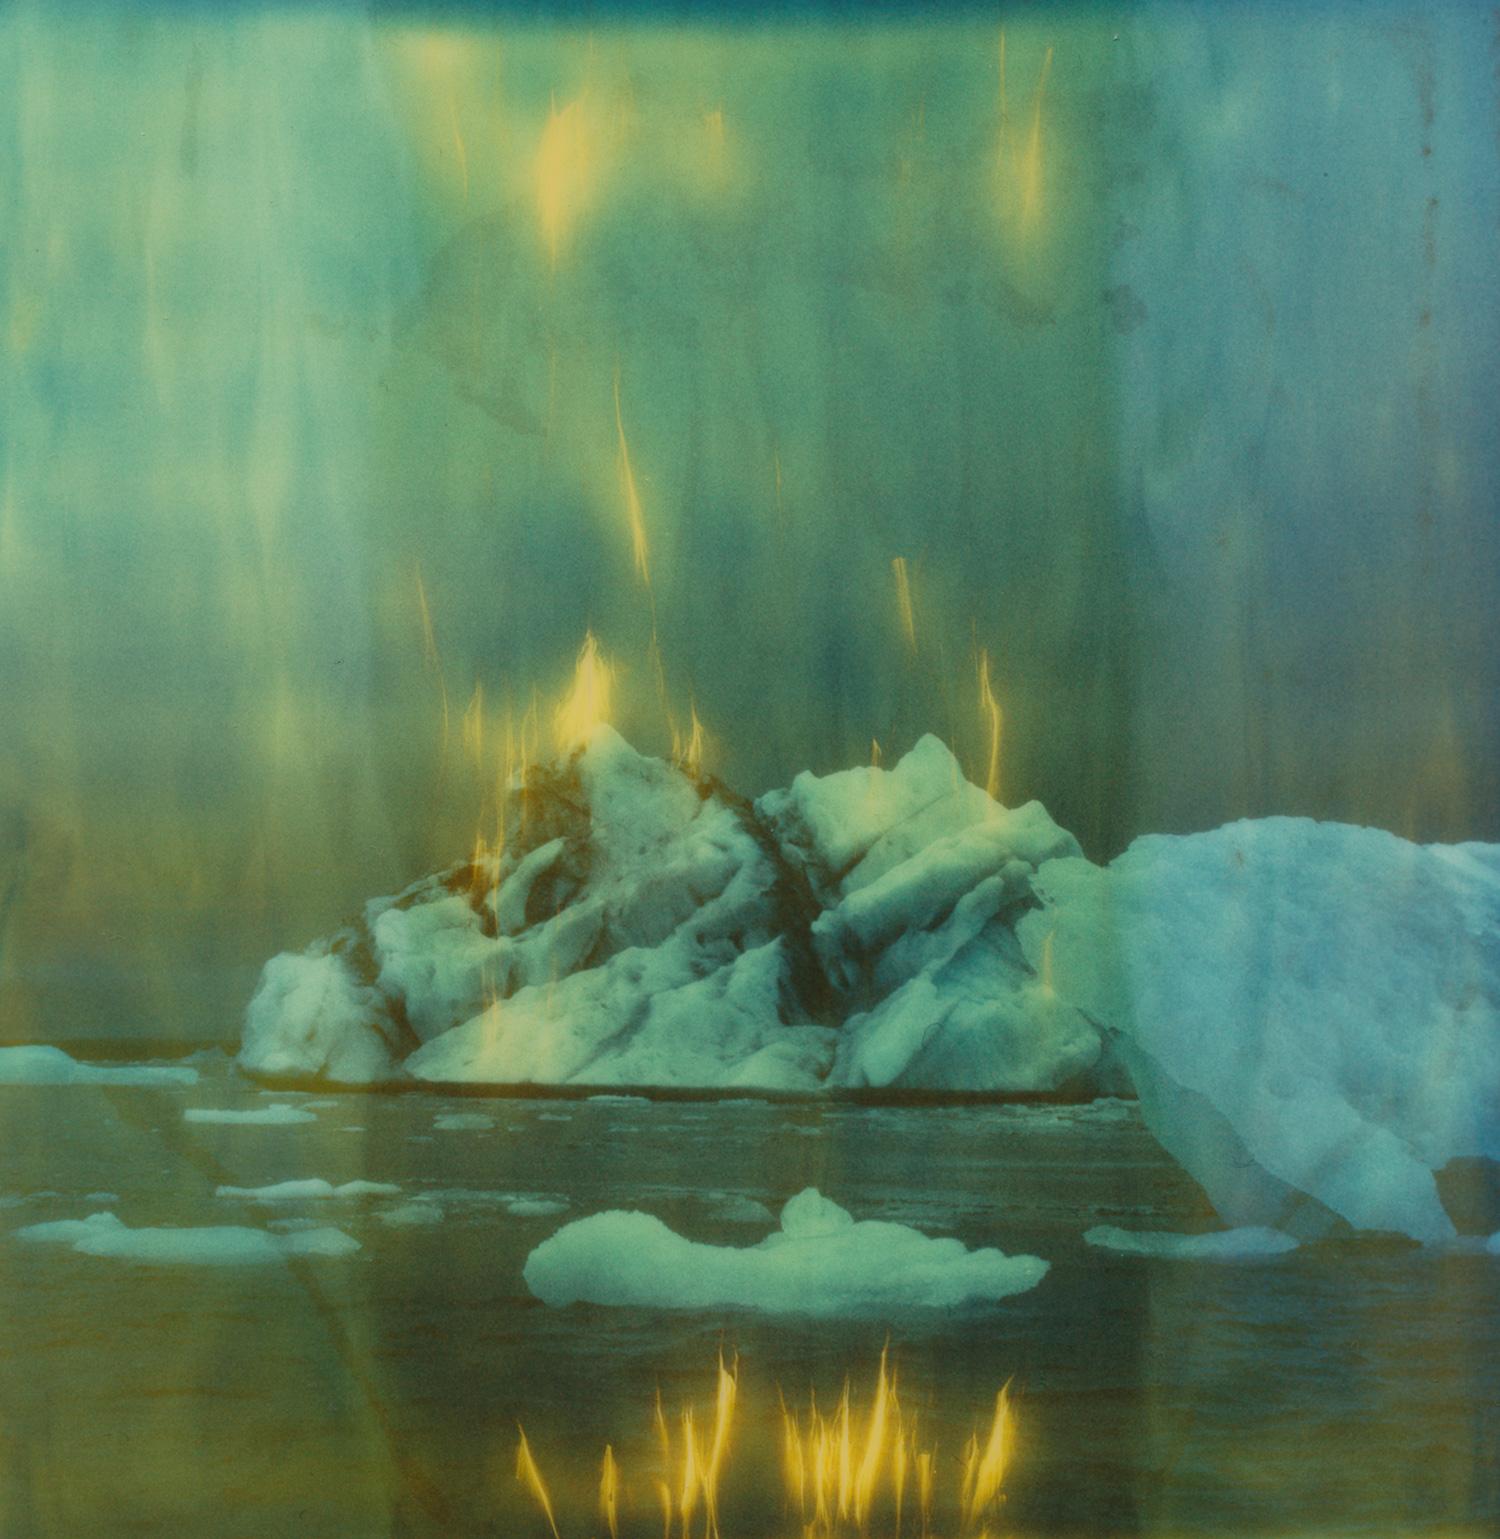 """Burning Down The Ice"" by  Jennifer Rumbach    Polaroid SX-70 + Expired Polaroid Time Zero Film"